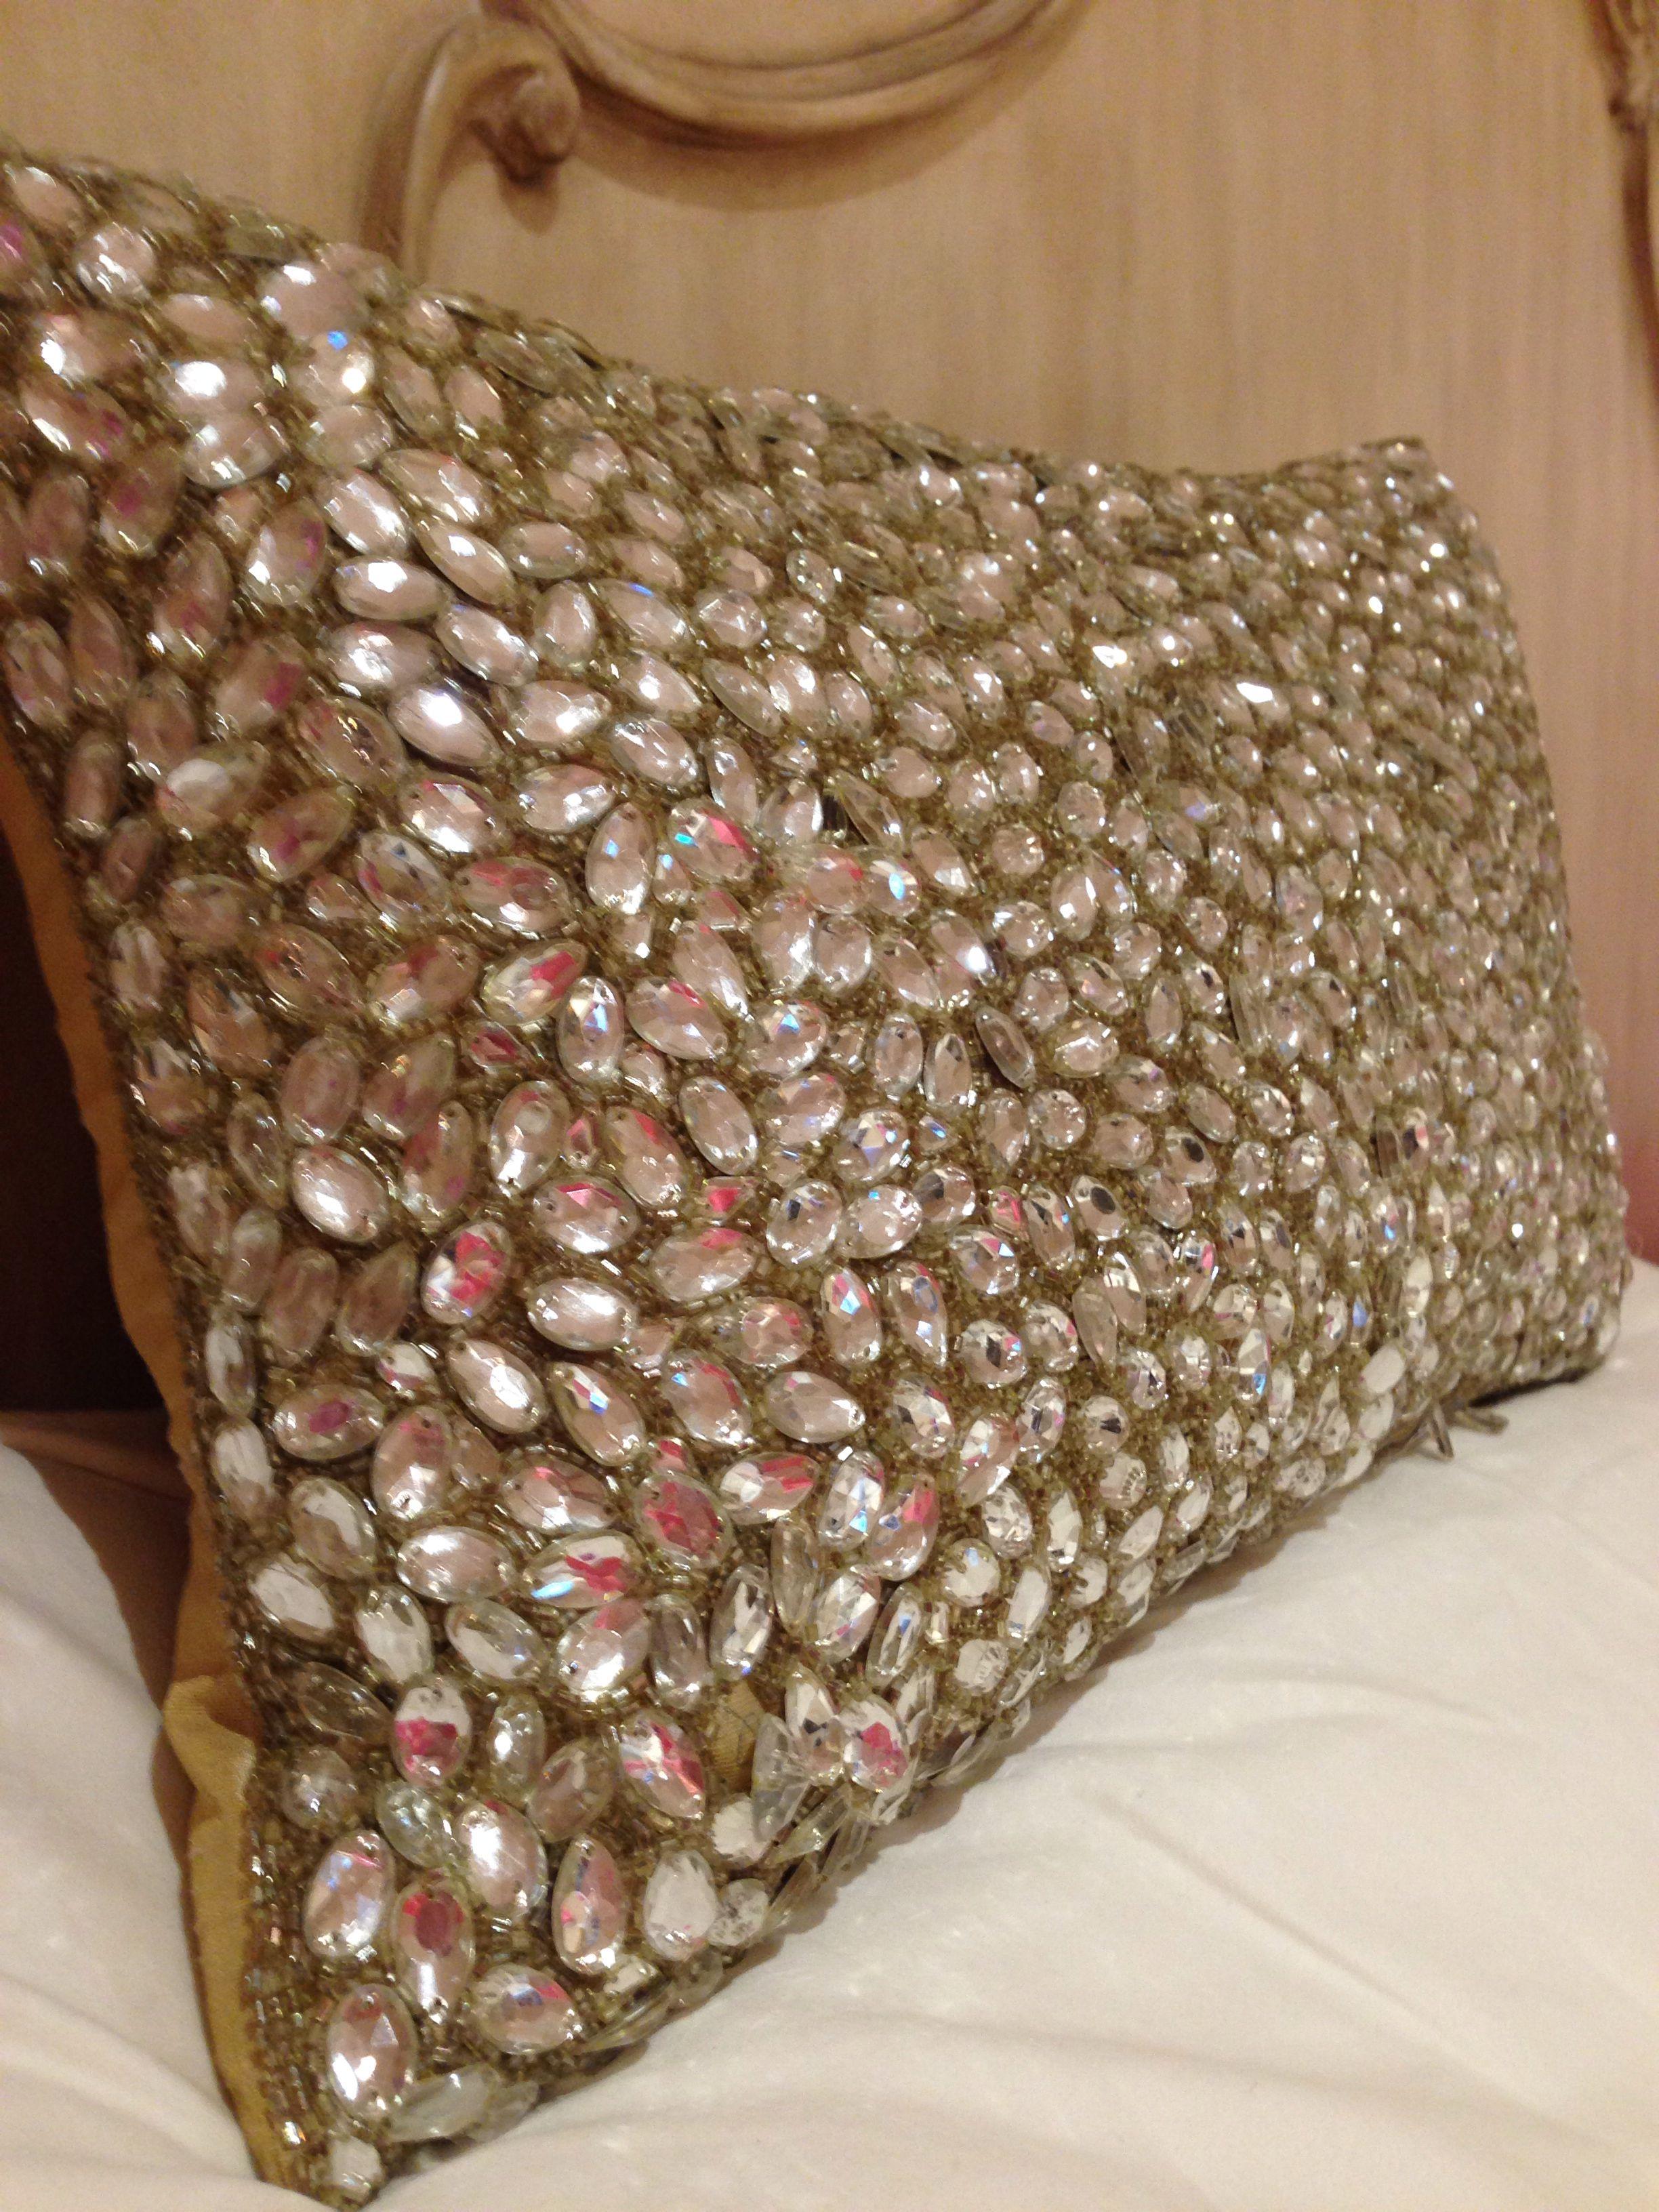 My Bling Pillow Home Decor Pinterest Bling Pillows